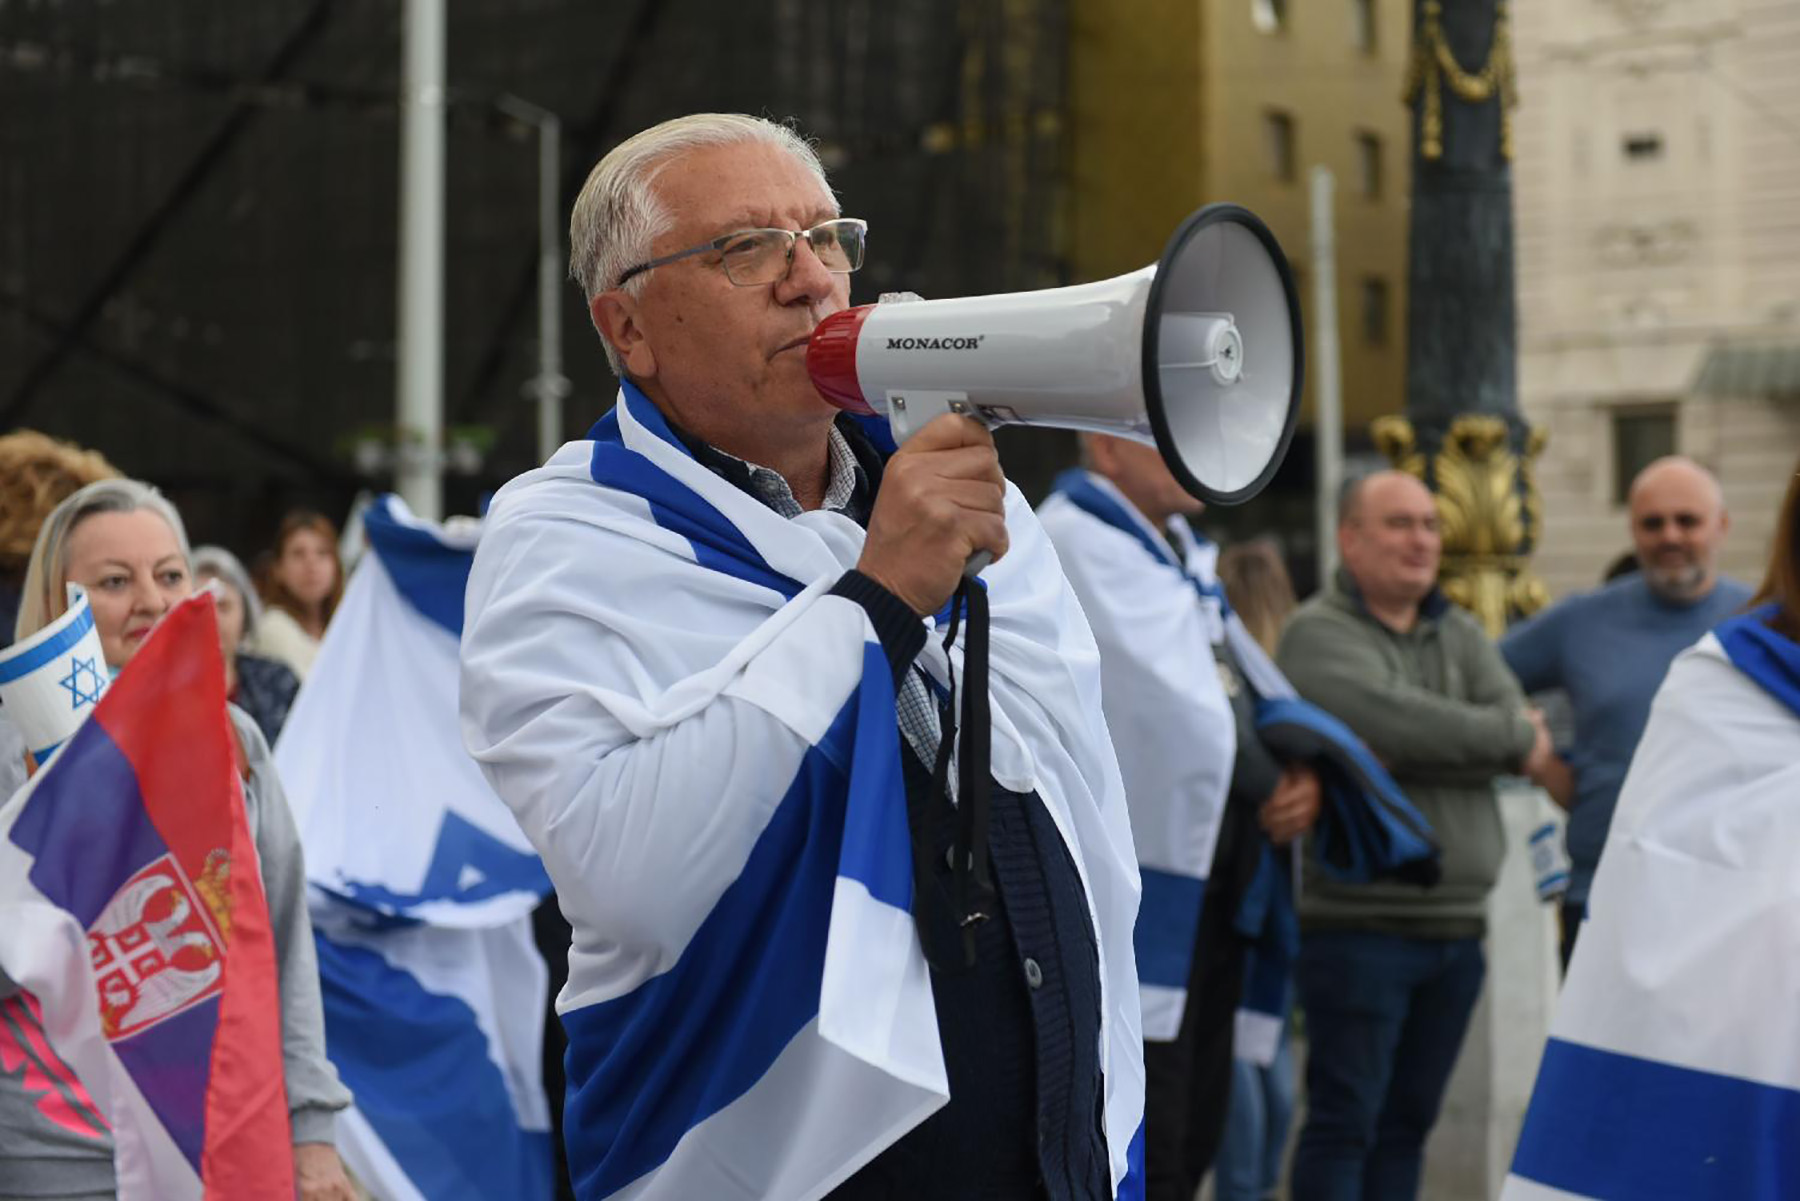 Avram Izrael Skup podrske Izraelu na Trgu republike u Beogradu